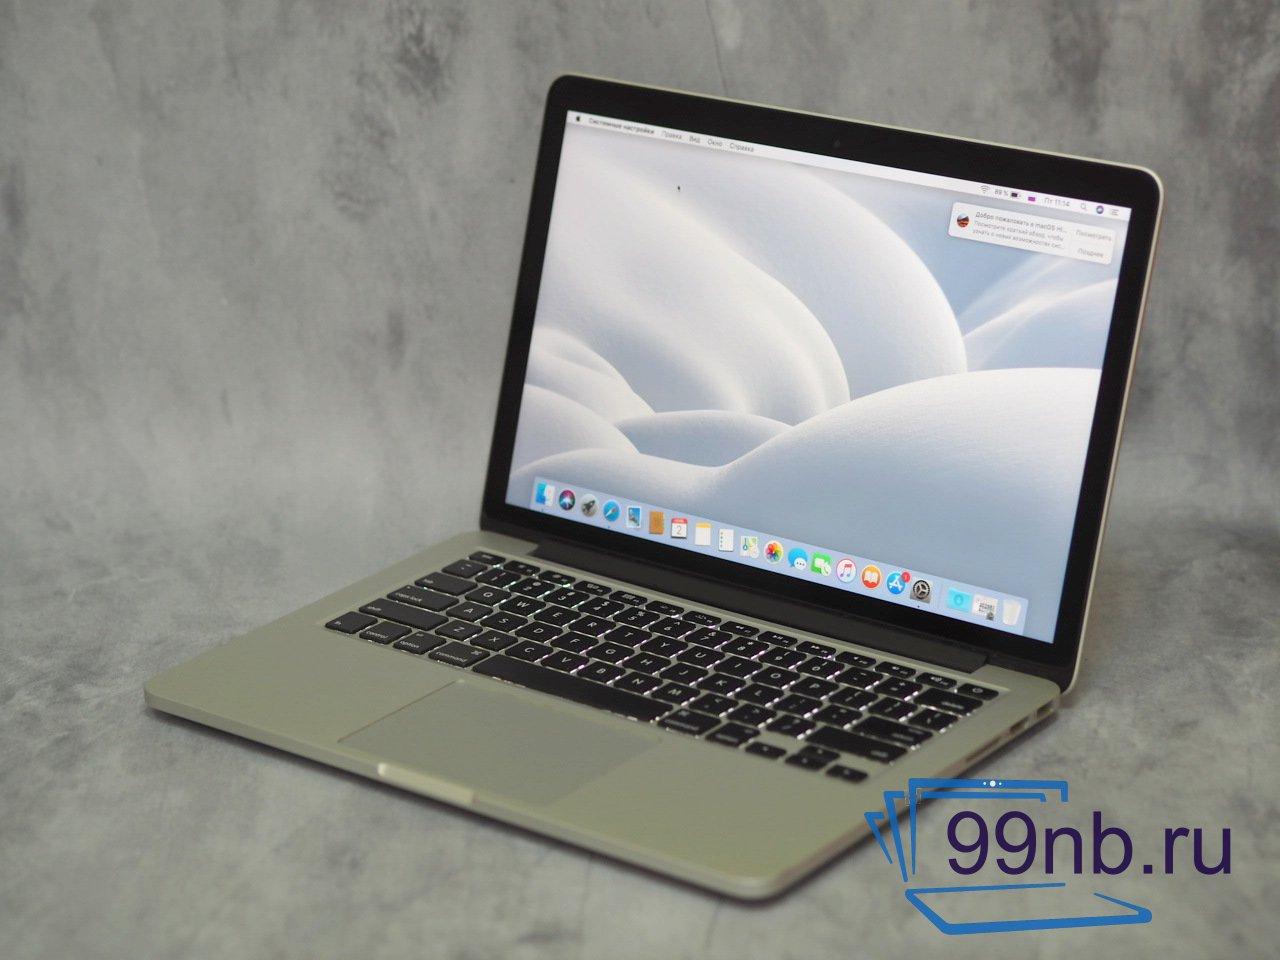 Macbook PRO  i7 / 750gb